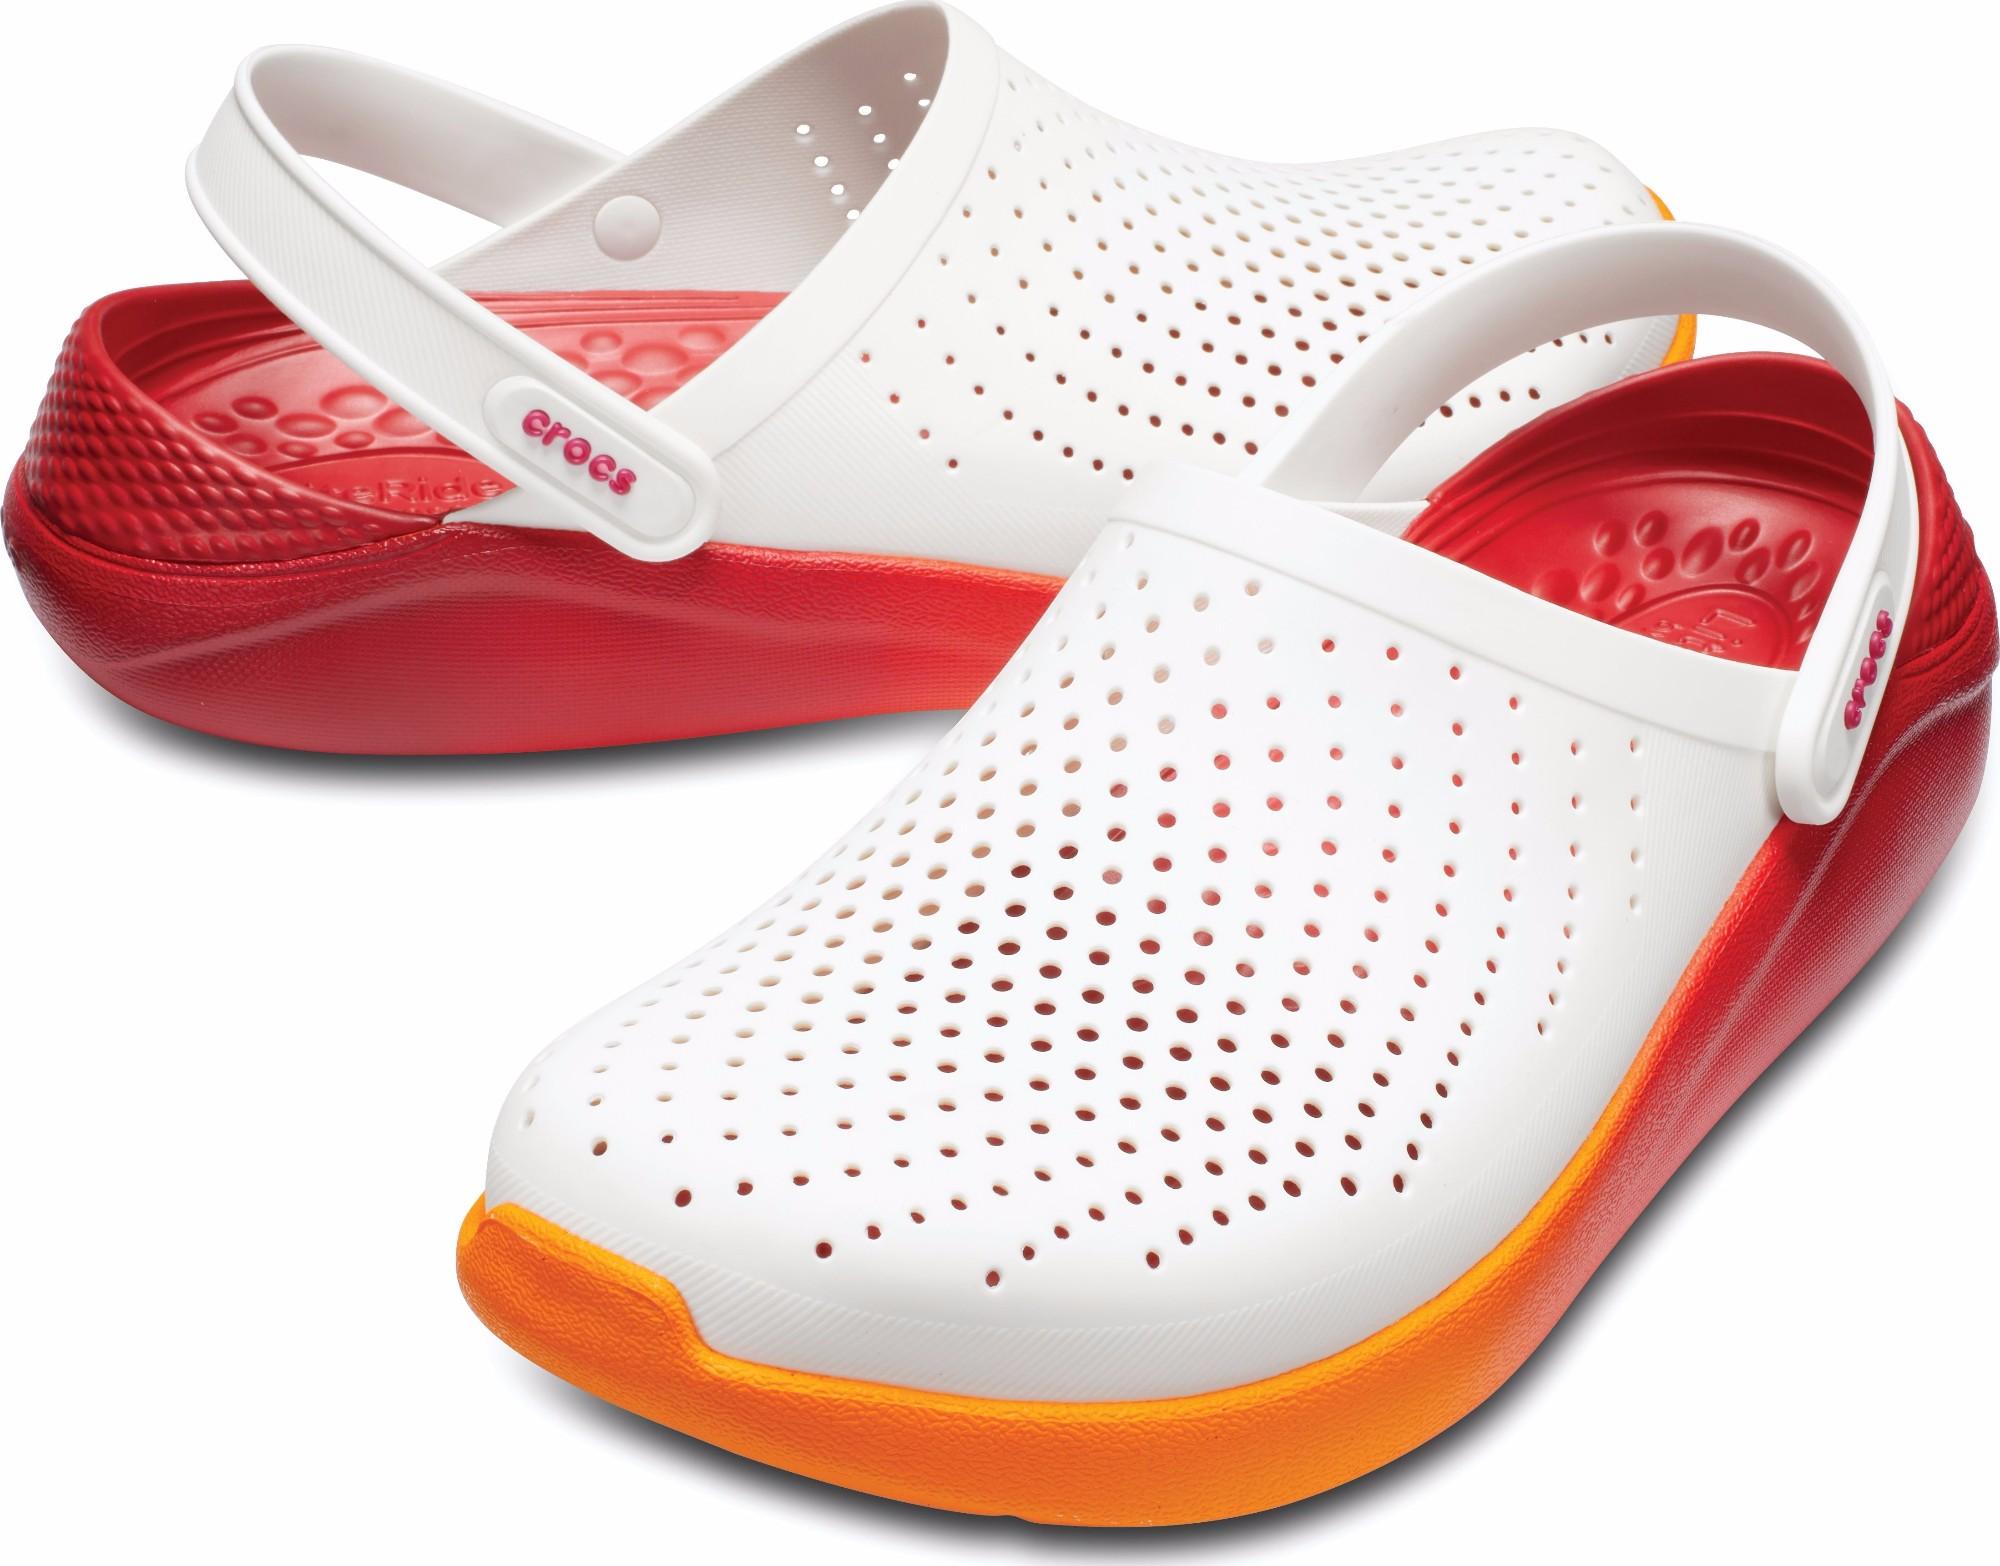 bcf7915be6445e Previous. Crocs™ LiteRide Graphic Clog White Orange ...